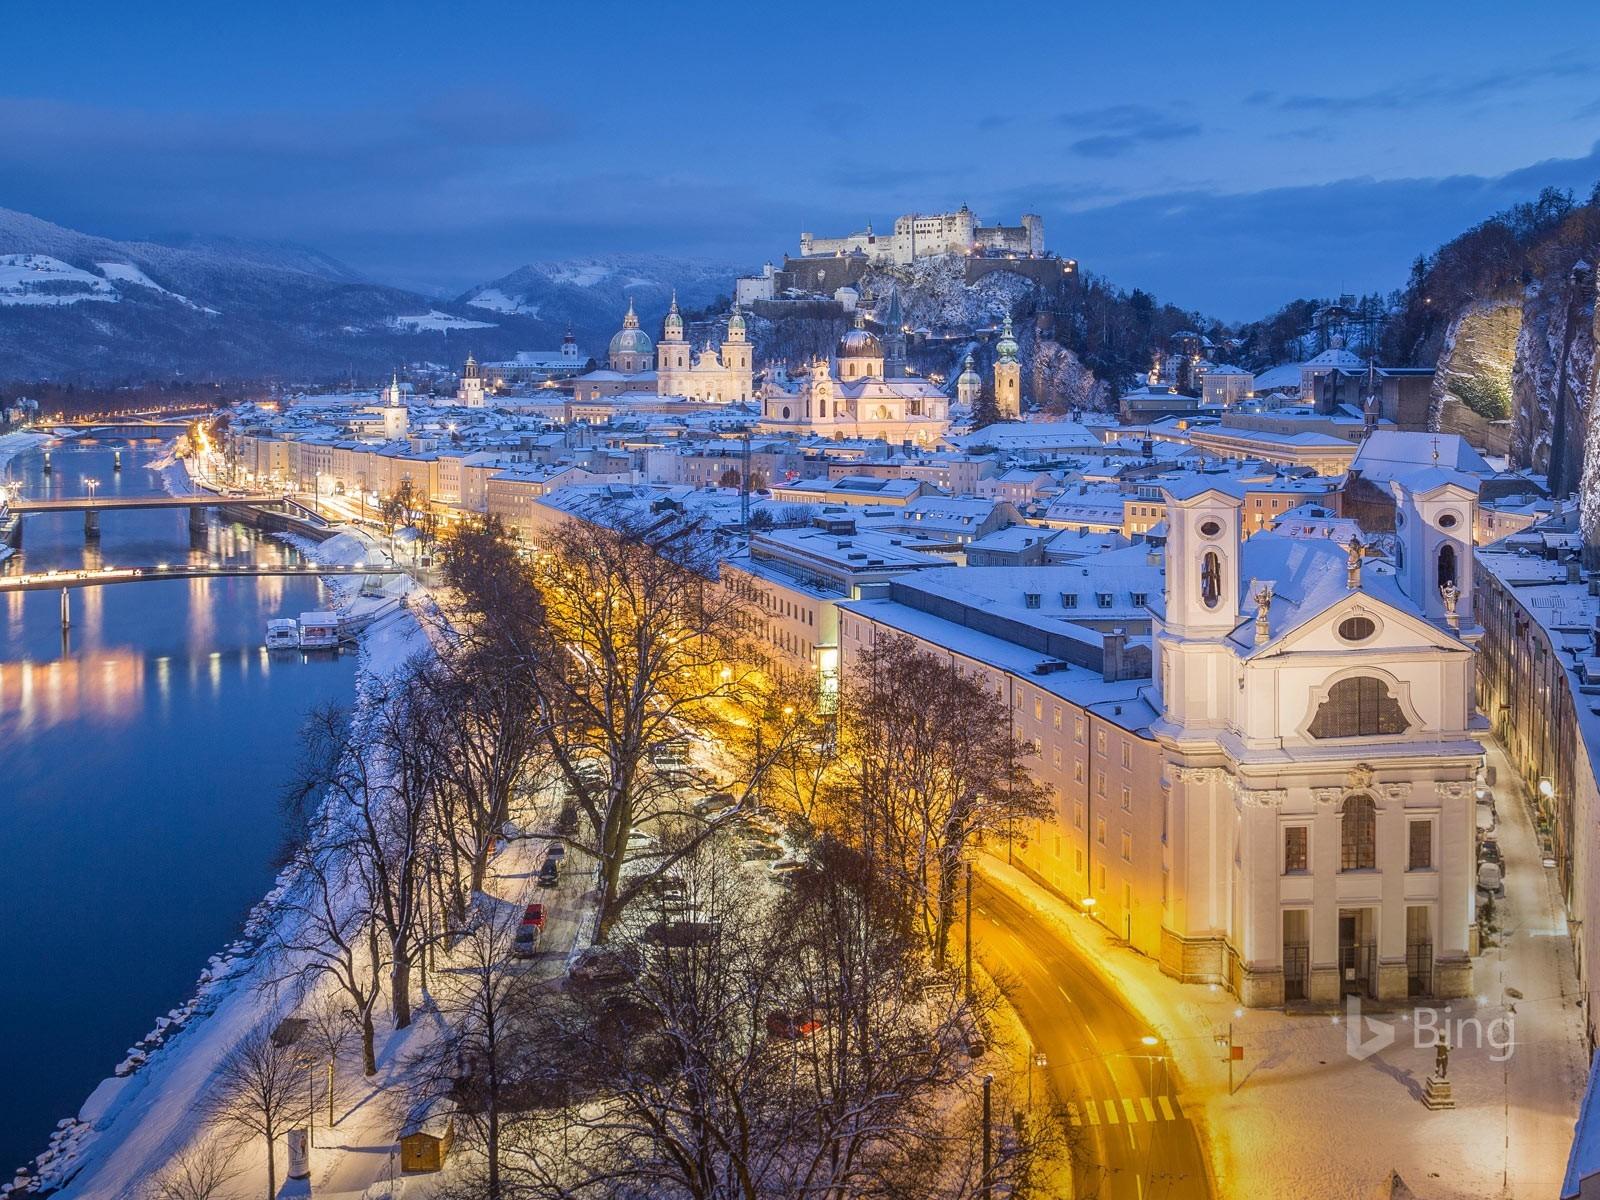 Salzburg Austria 2018 Bing Wallpaper Preview 10wallpaper Com